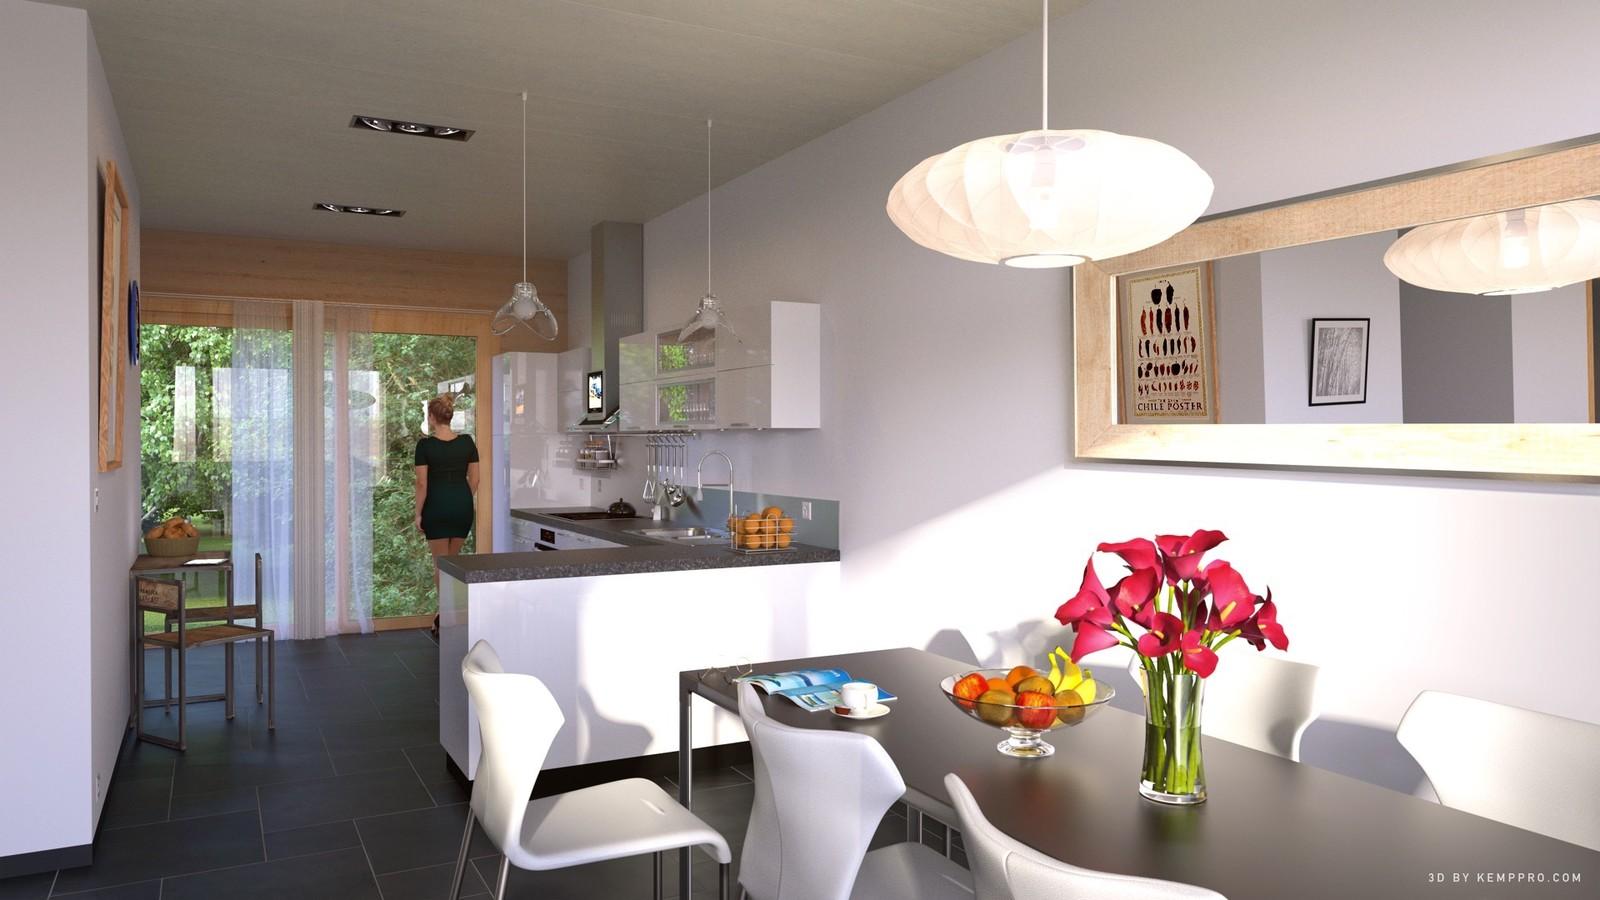 Architect - Braa Geneva  01 Dining to Cuisine L-R   KP webpage of project: http://www.kemppro.com/KP_3D_communication_3_Villas_Veyrier.html